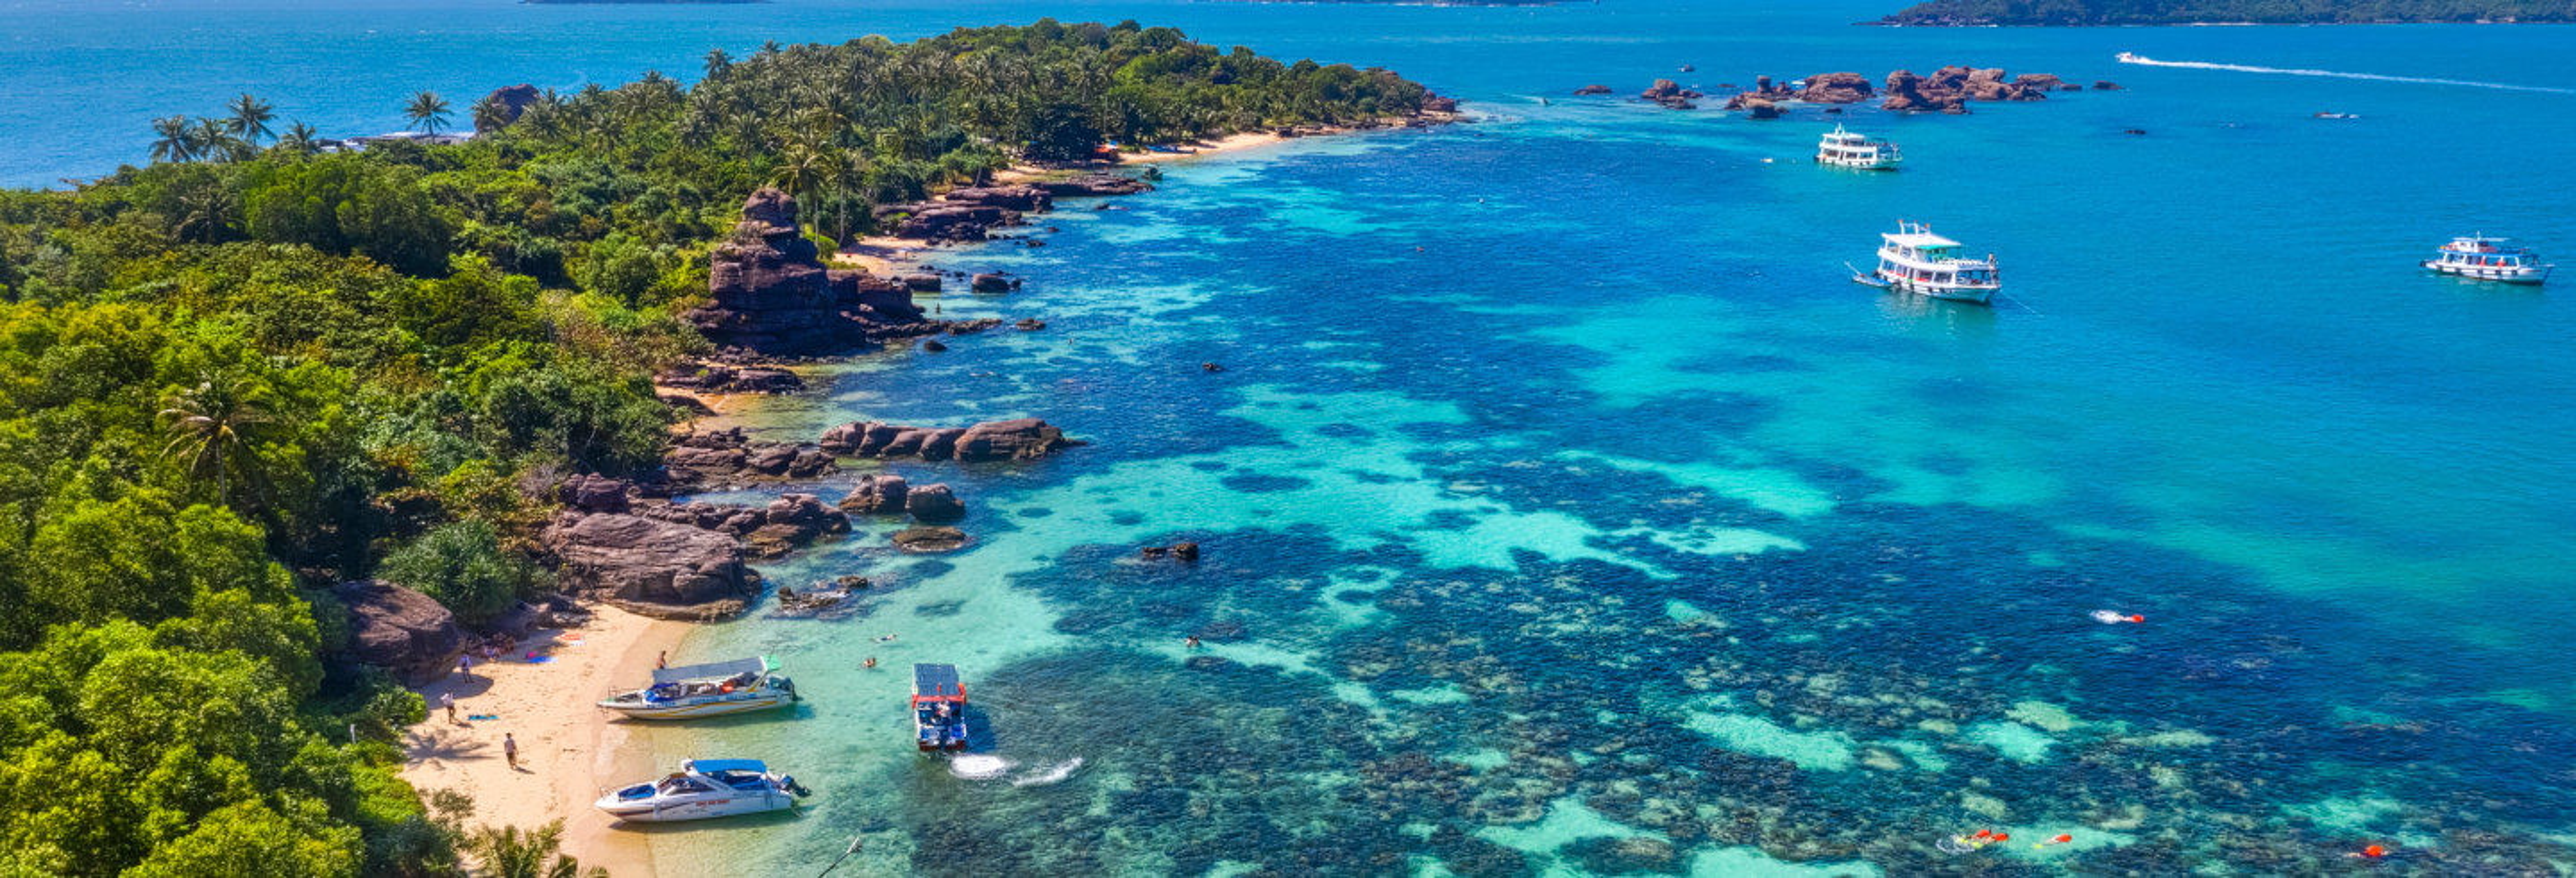 Excursão às ilhas Mong Tay, May Rut e Gam Ghi